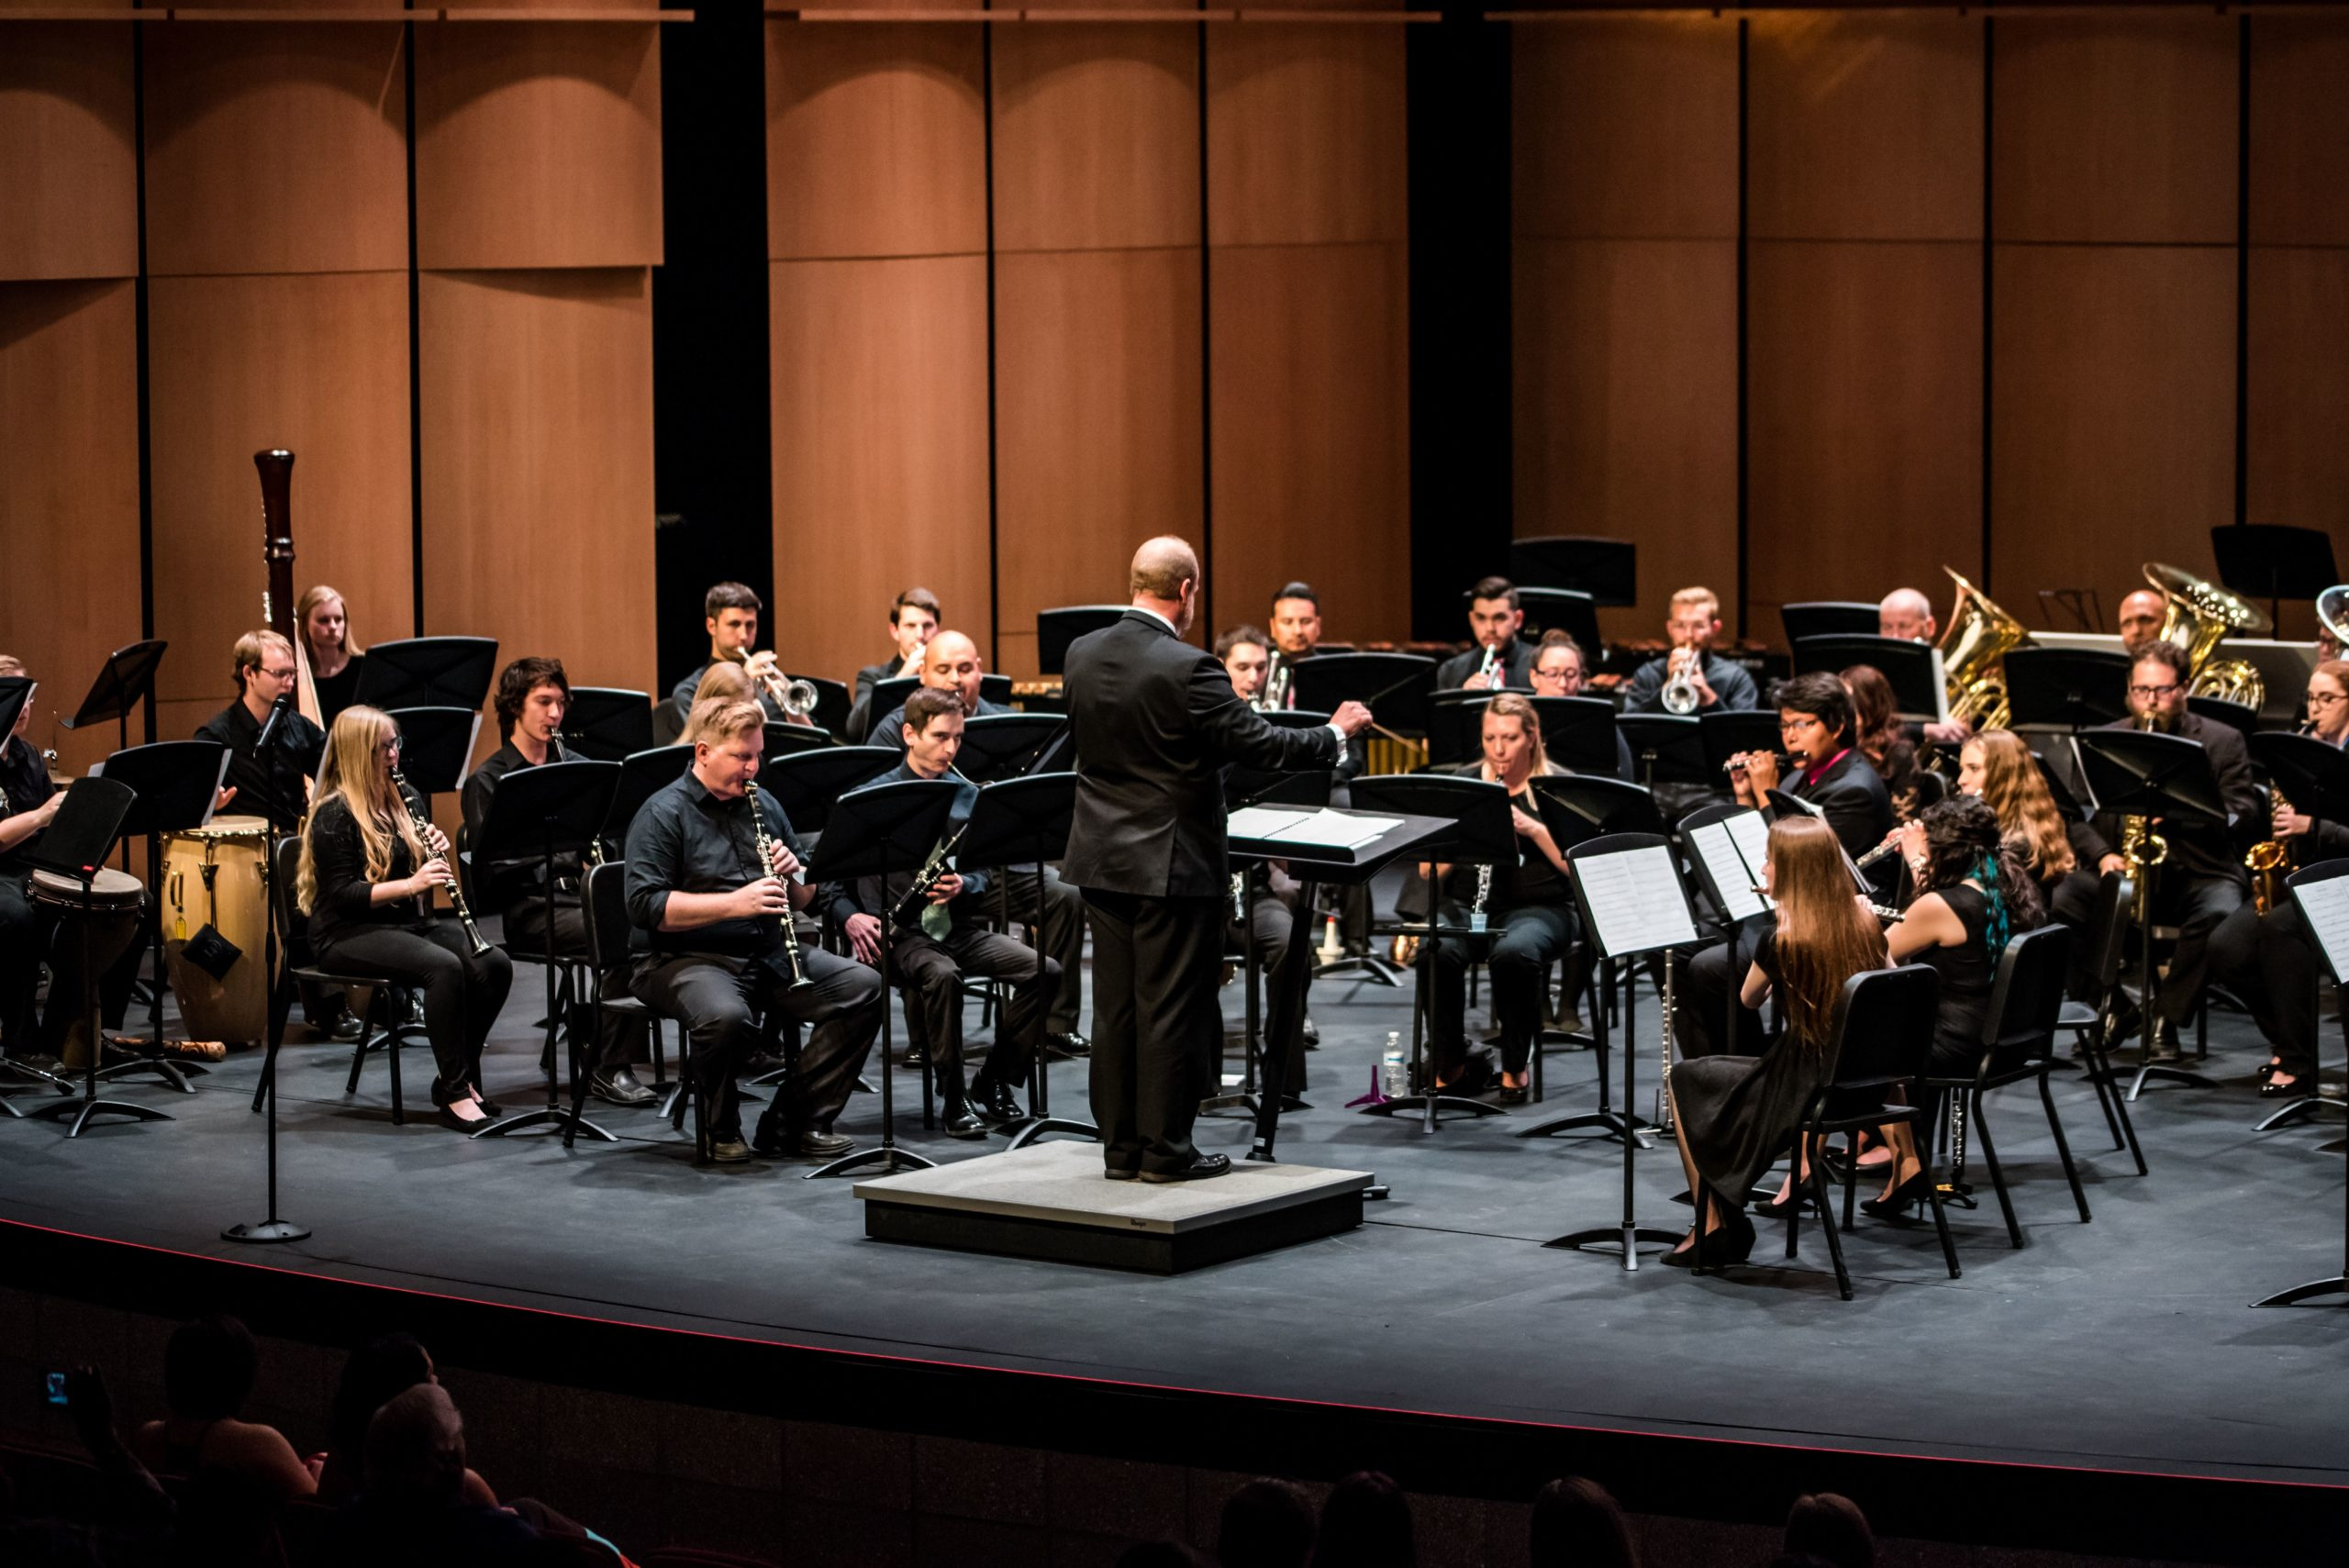 mcc concert band program image